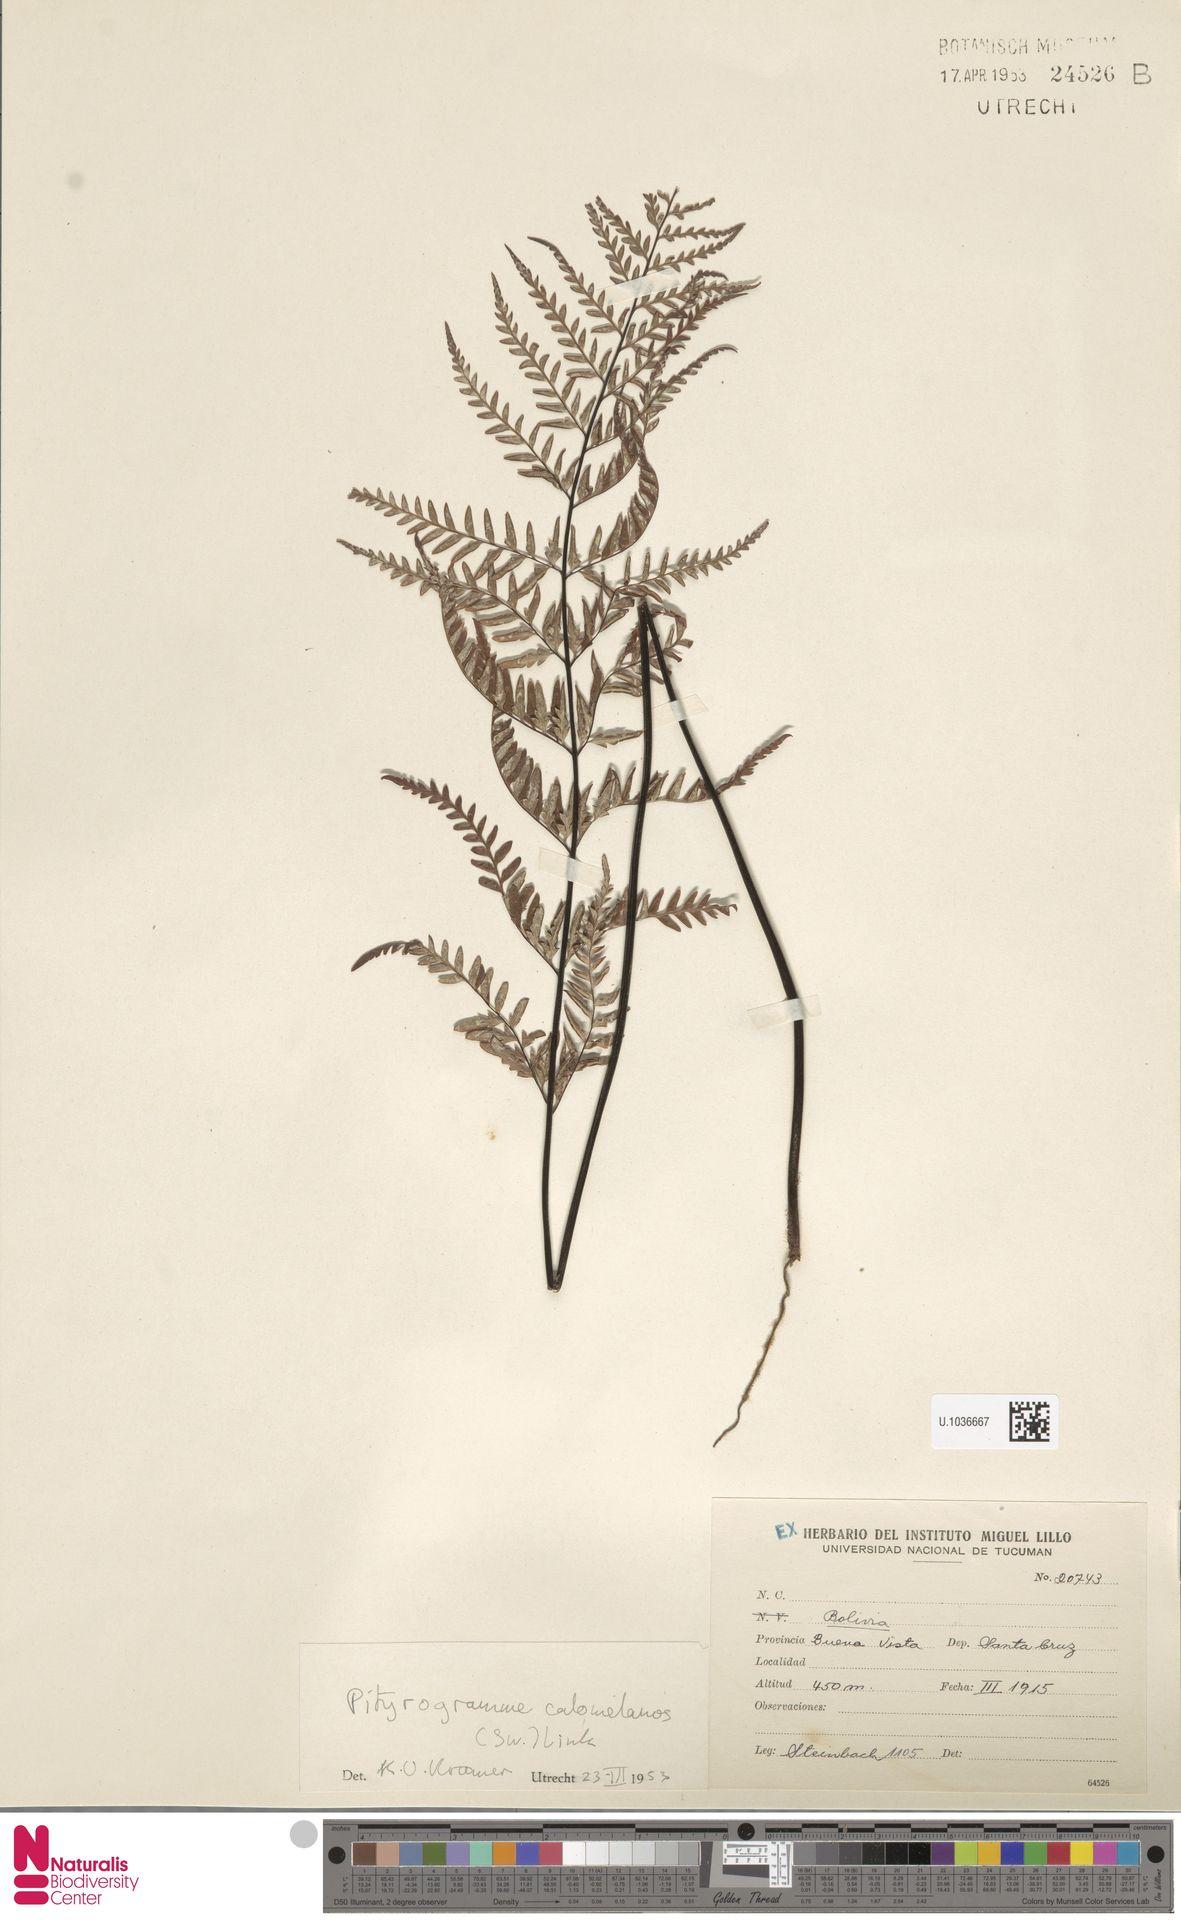 U.1036667 | Pityrogramma calomelanos (L.) Link